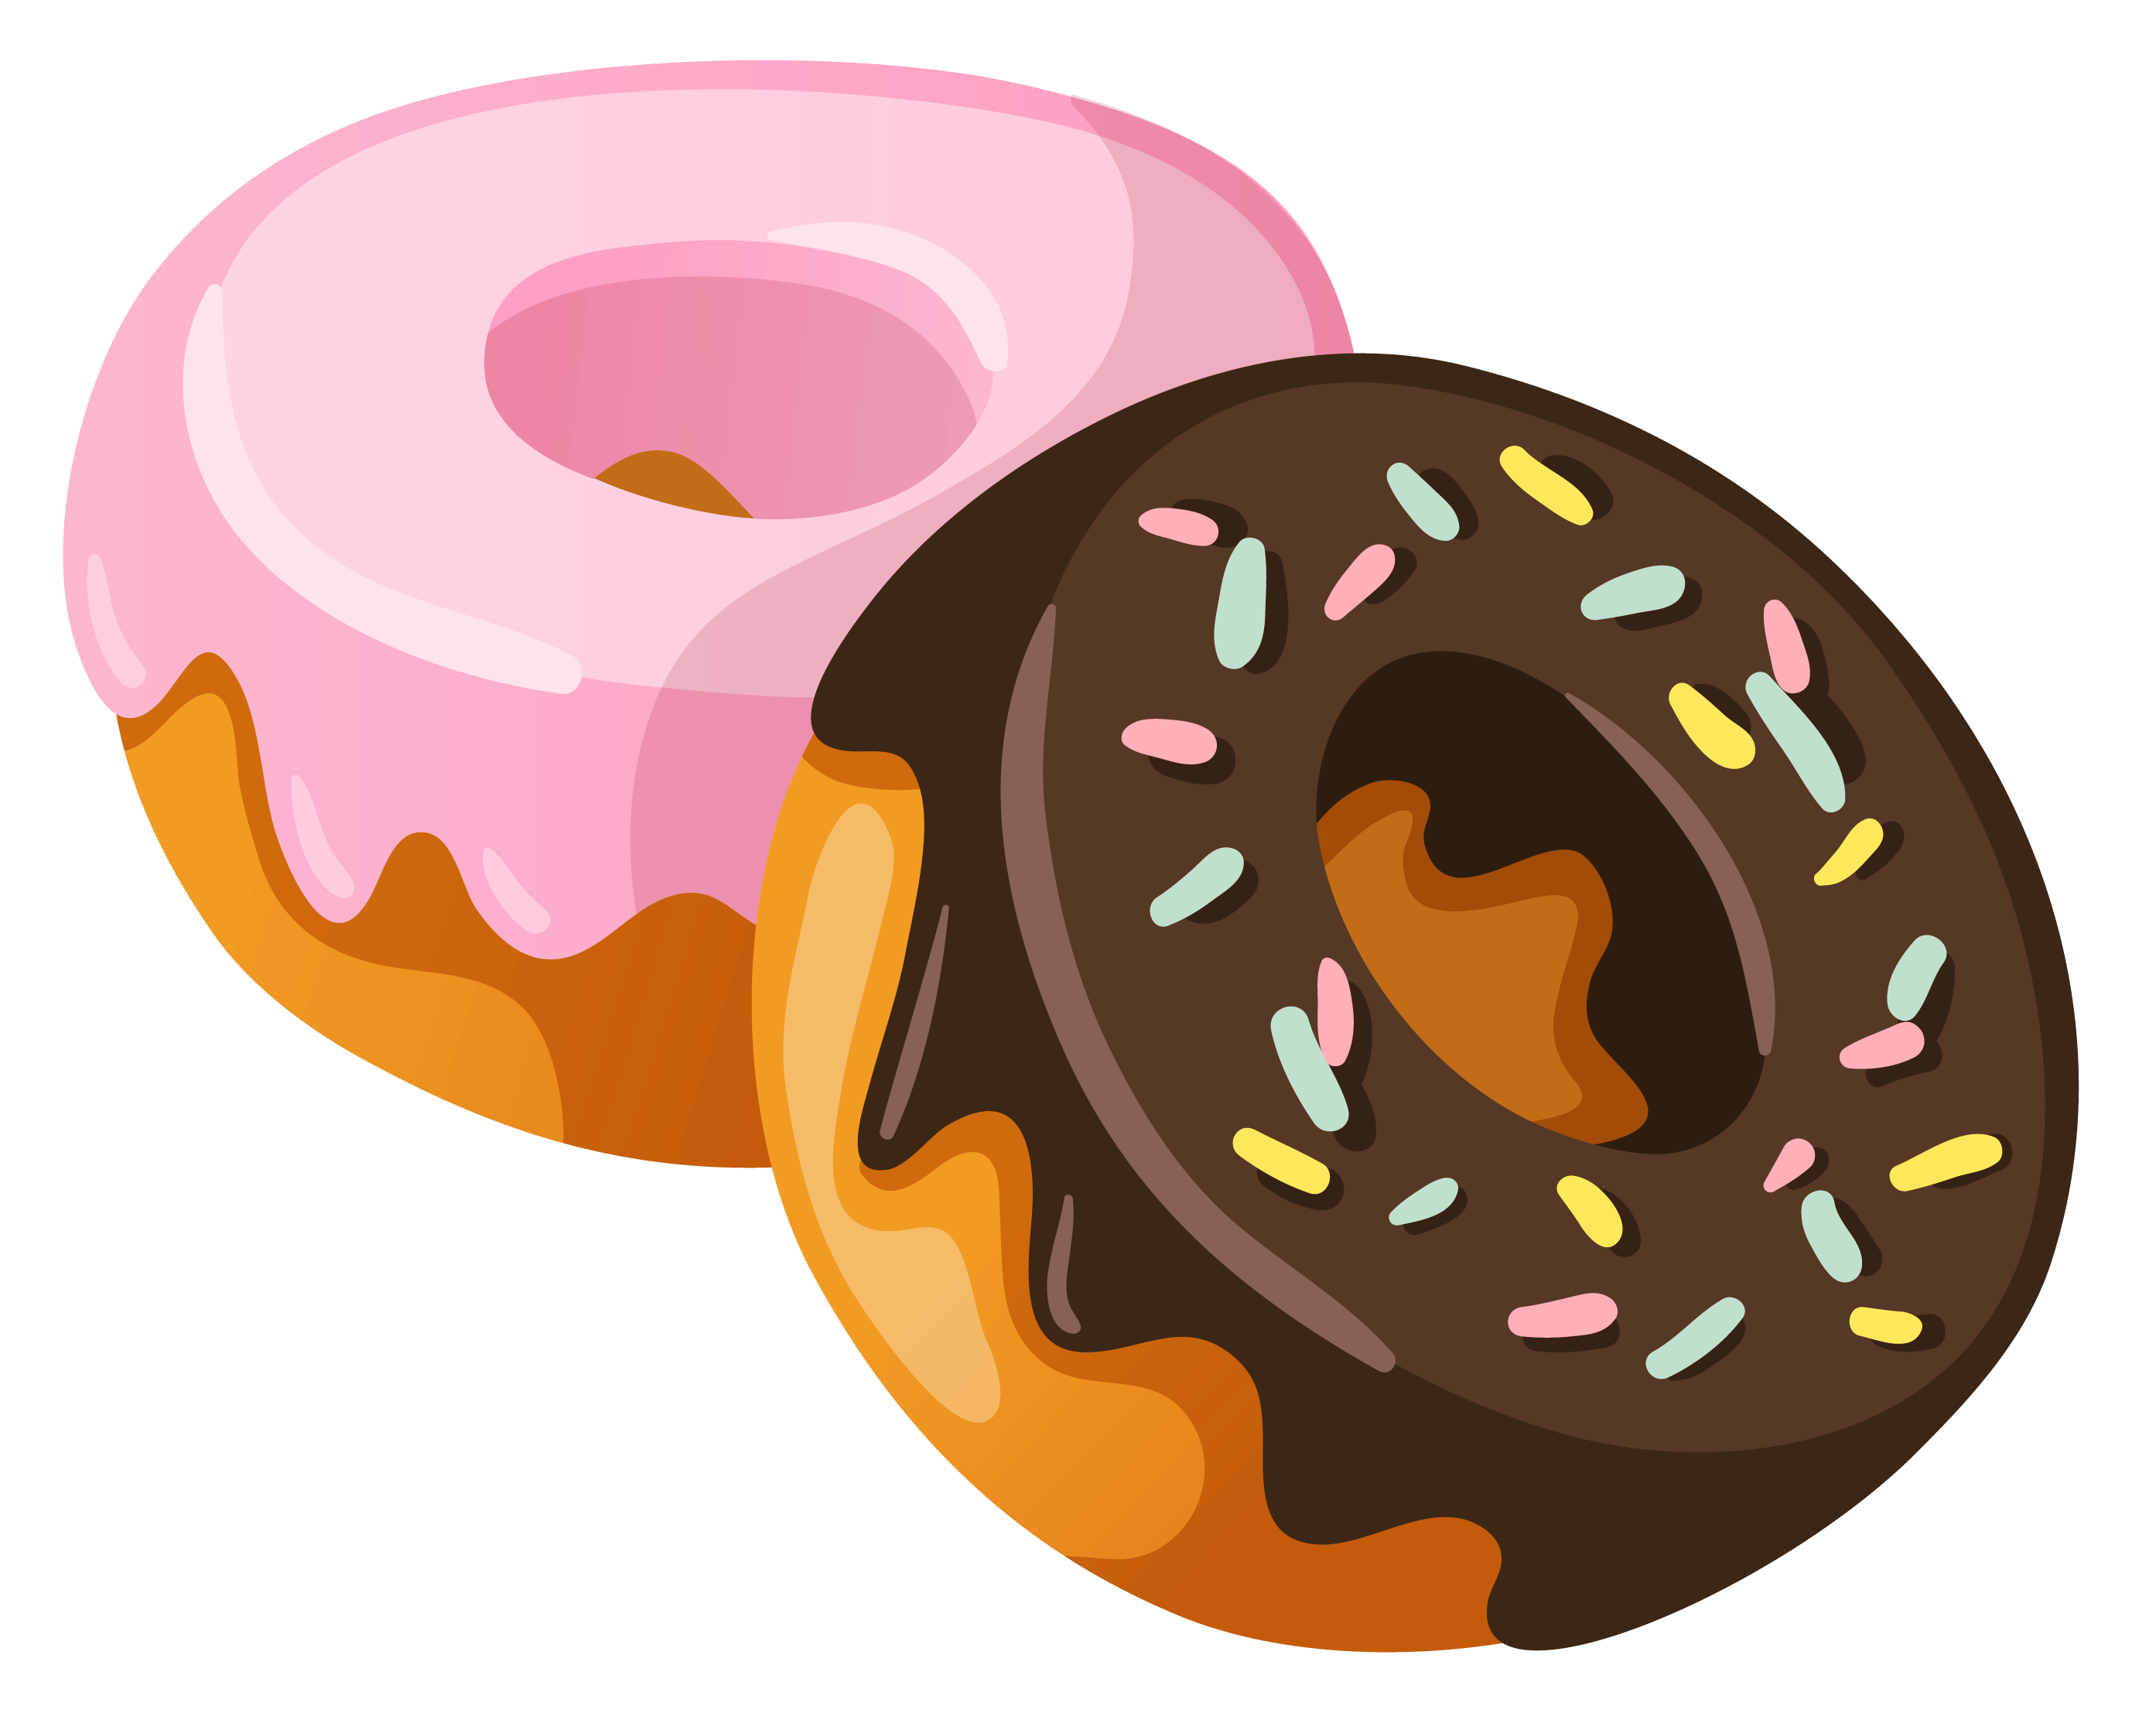 Donut Png Image Donut Art Food Clips Food Art